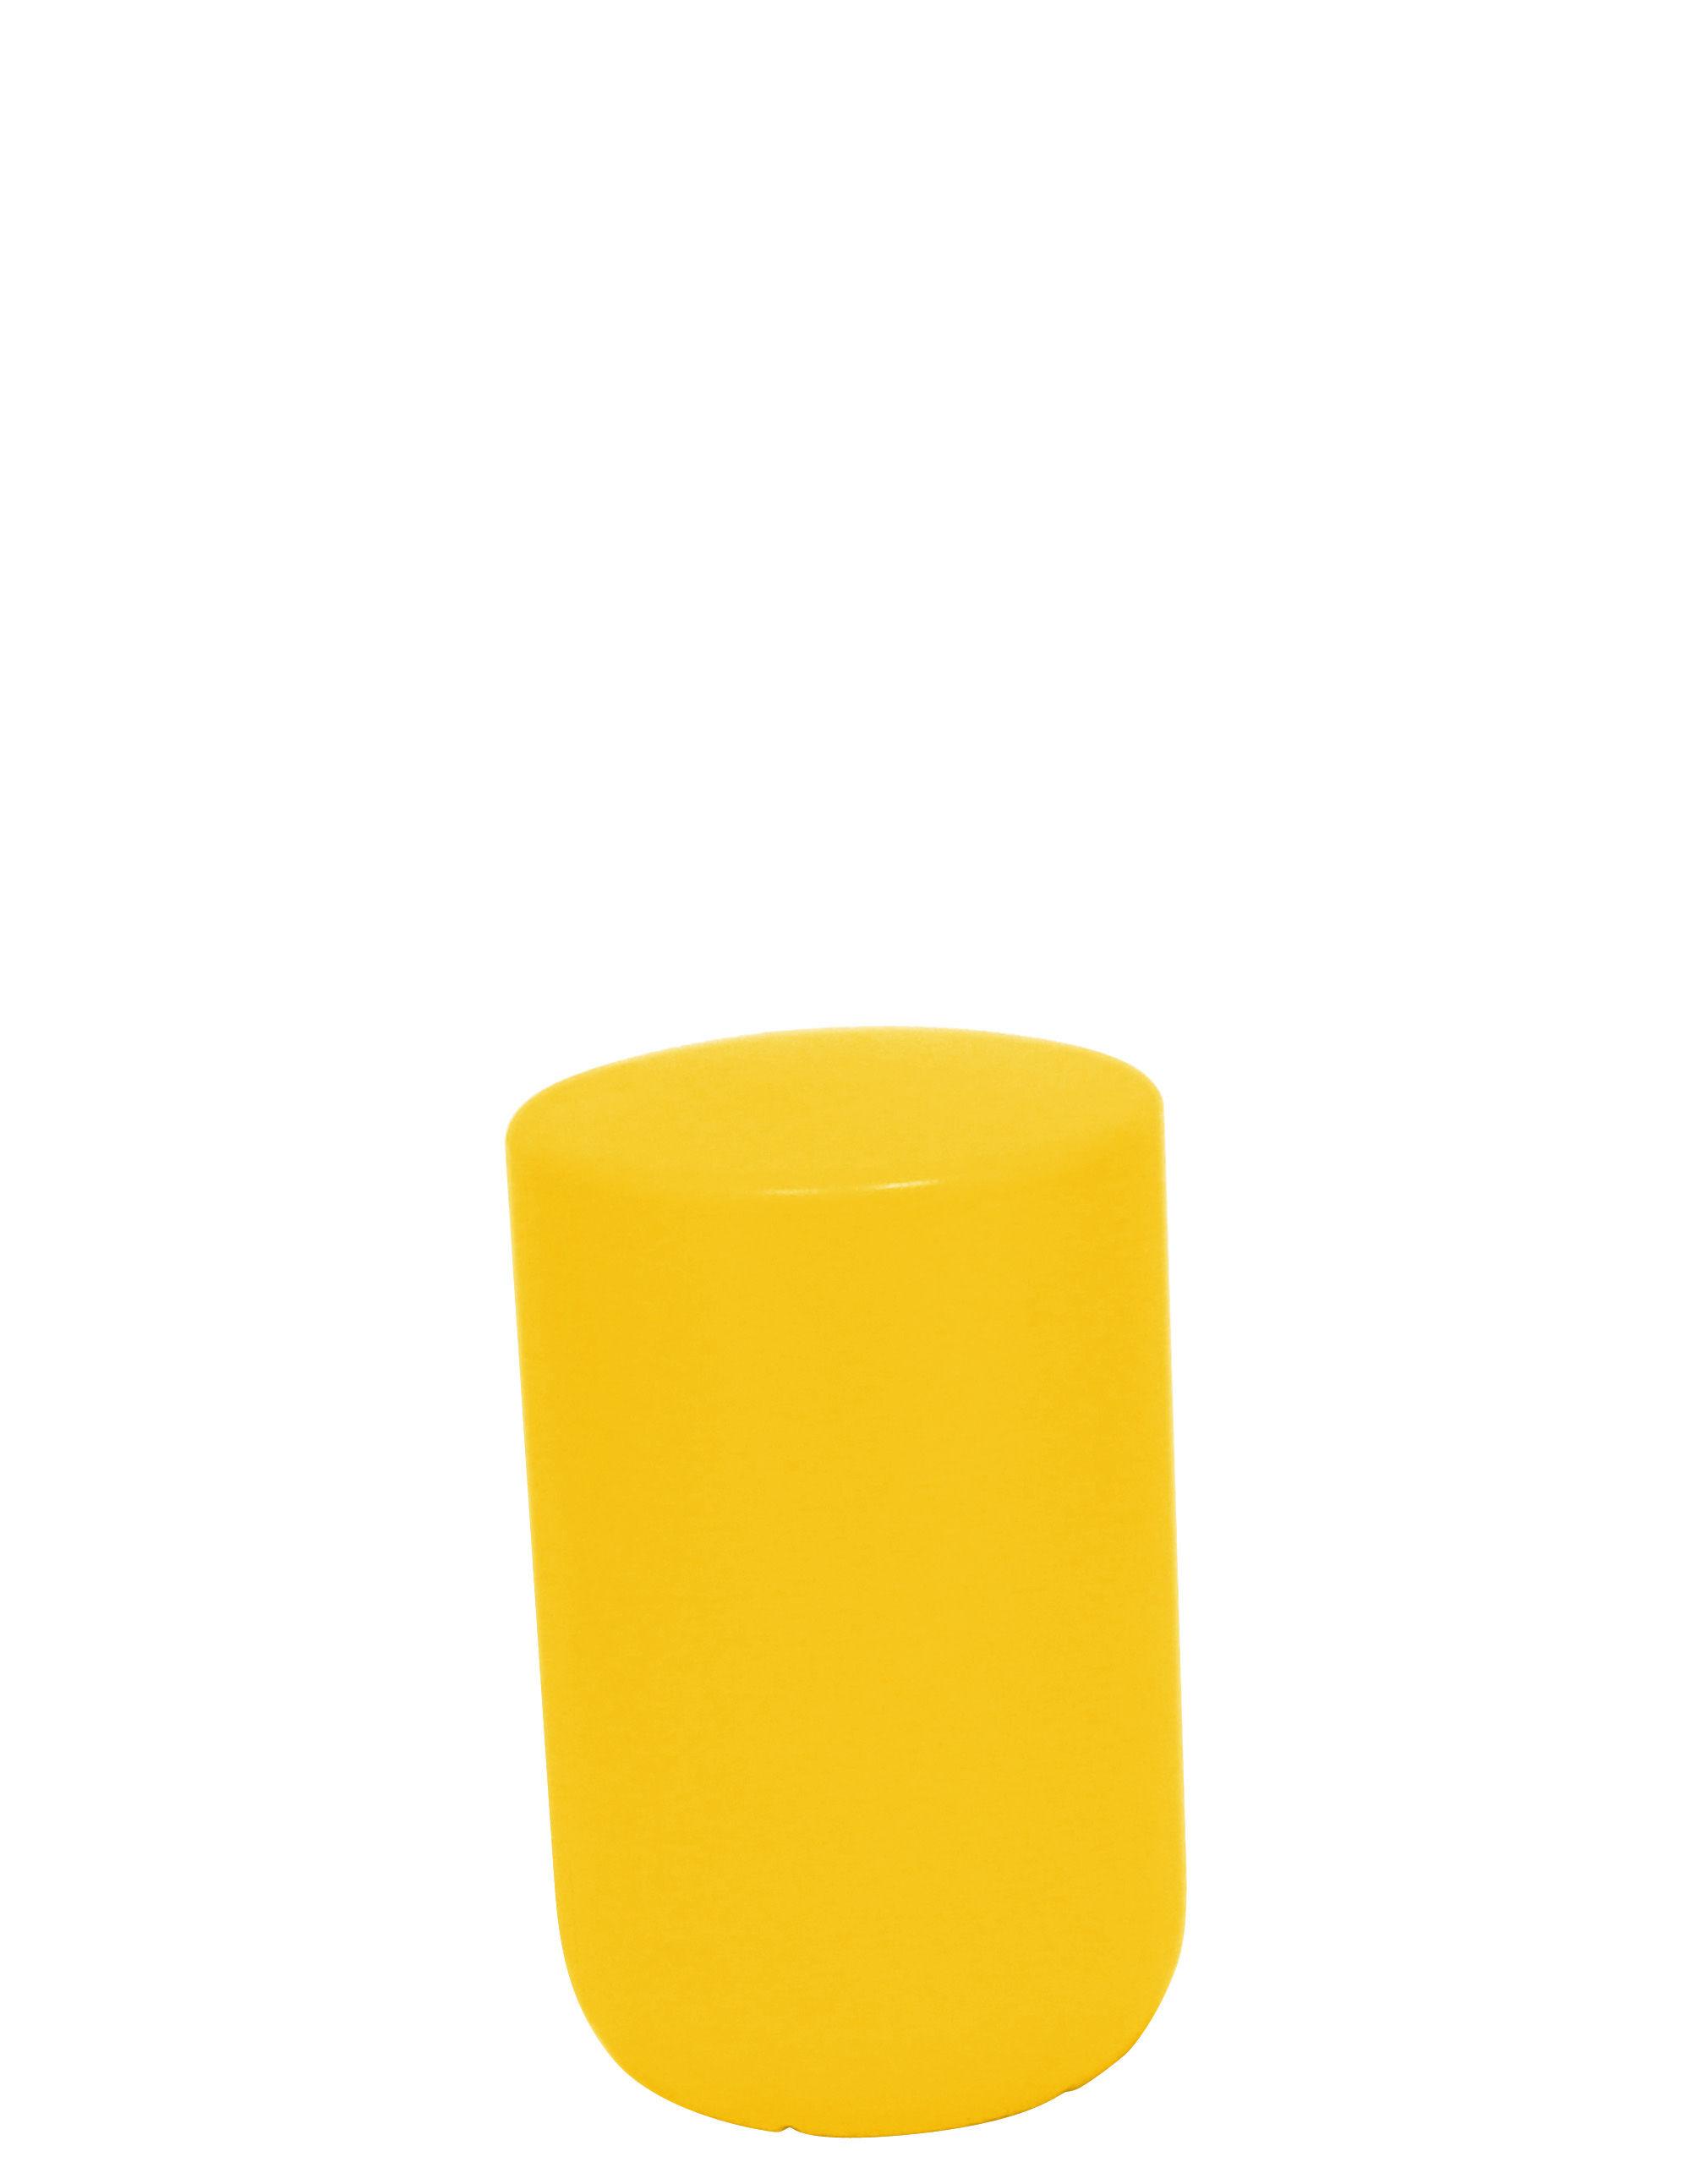 Möbel - Möbel für Kinder - Sway Kinderhocker / H 34 cm - Thelermont Hupton - Gelb - Polyäthylen